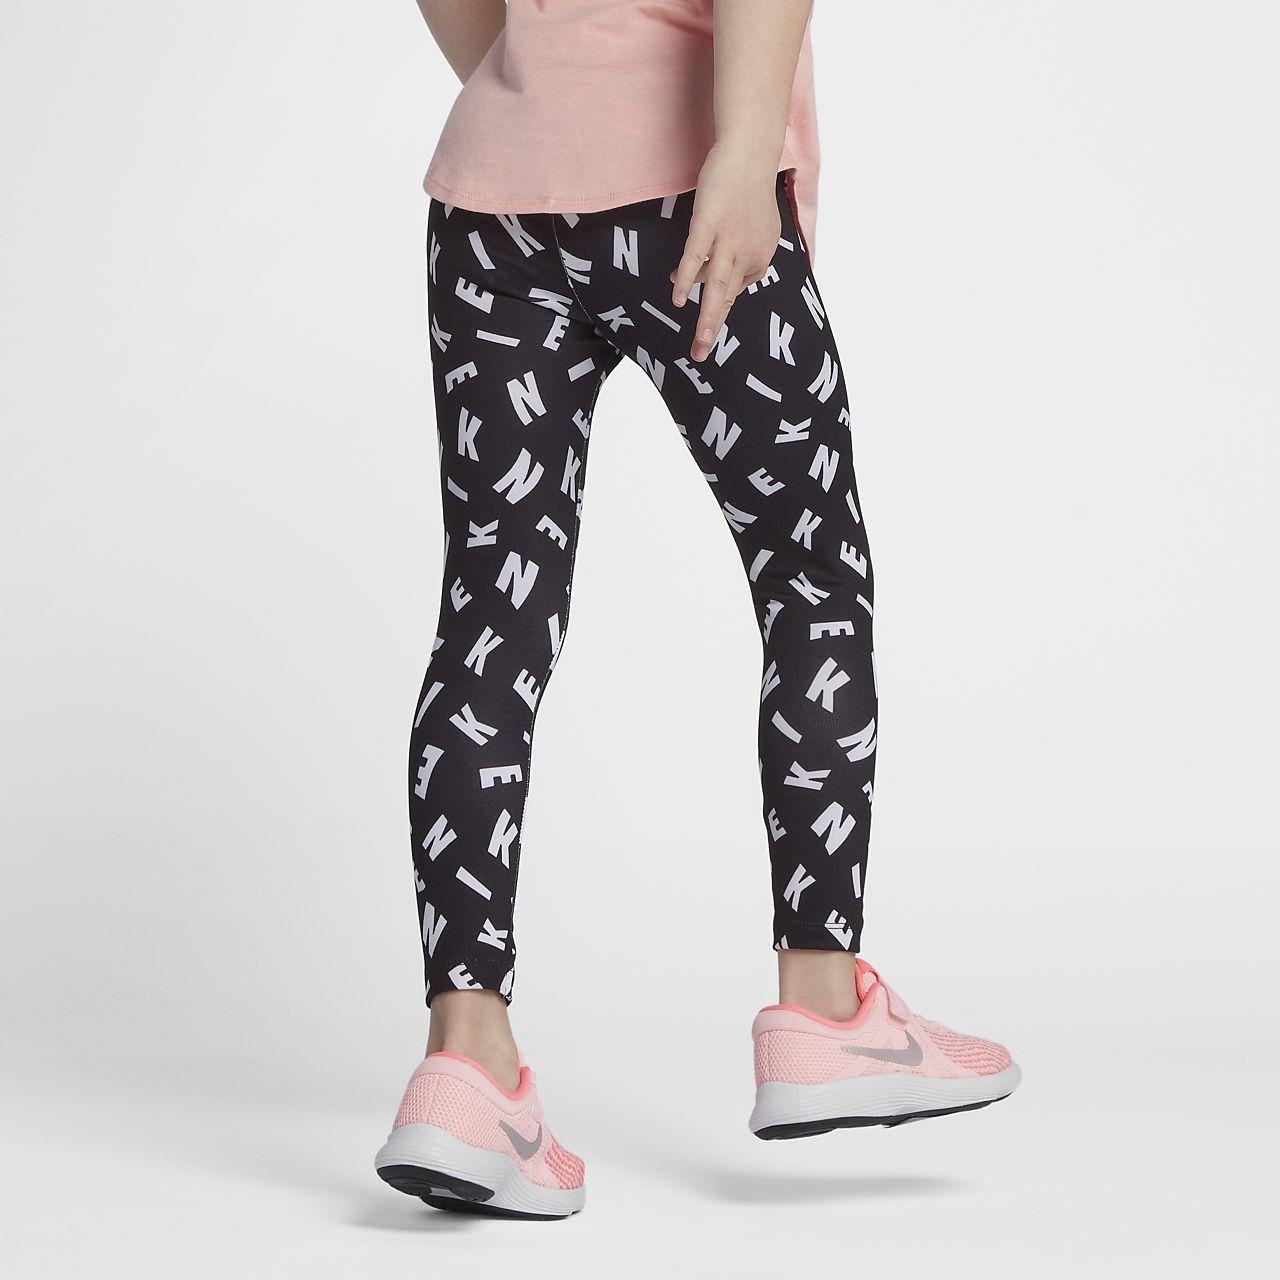 c2c3eb434 Nike Dri-Fit Sport Essentials Little Kids' (Girls') Printed Leggings - 6X